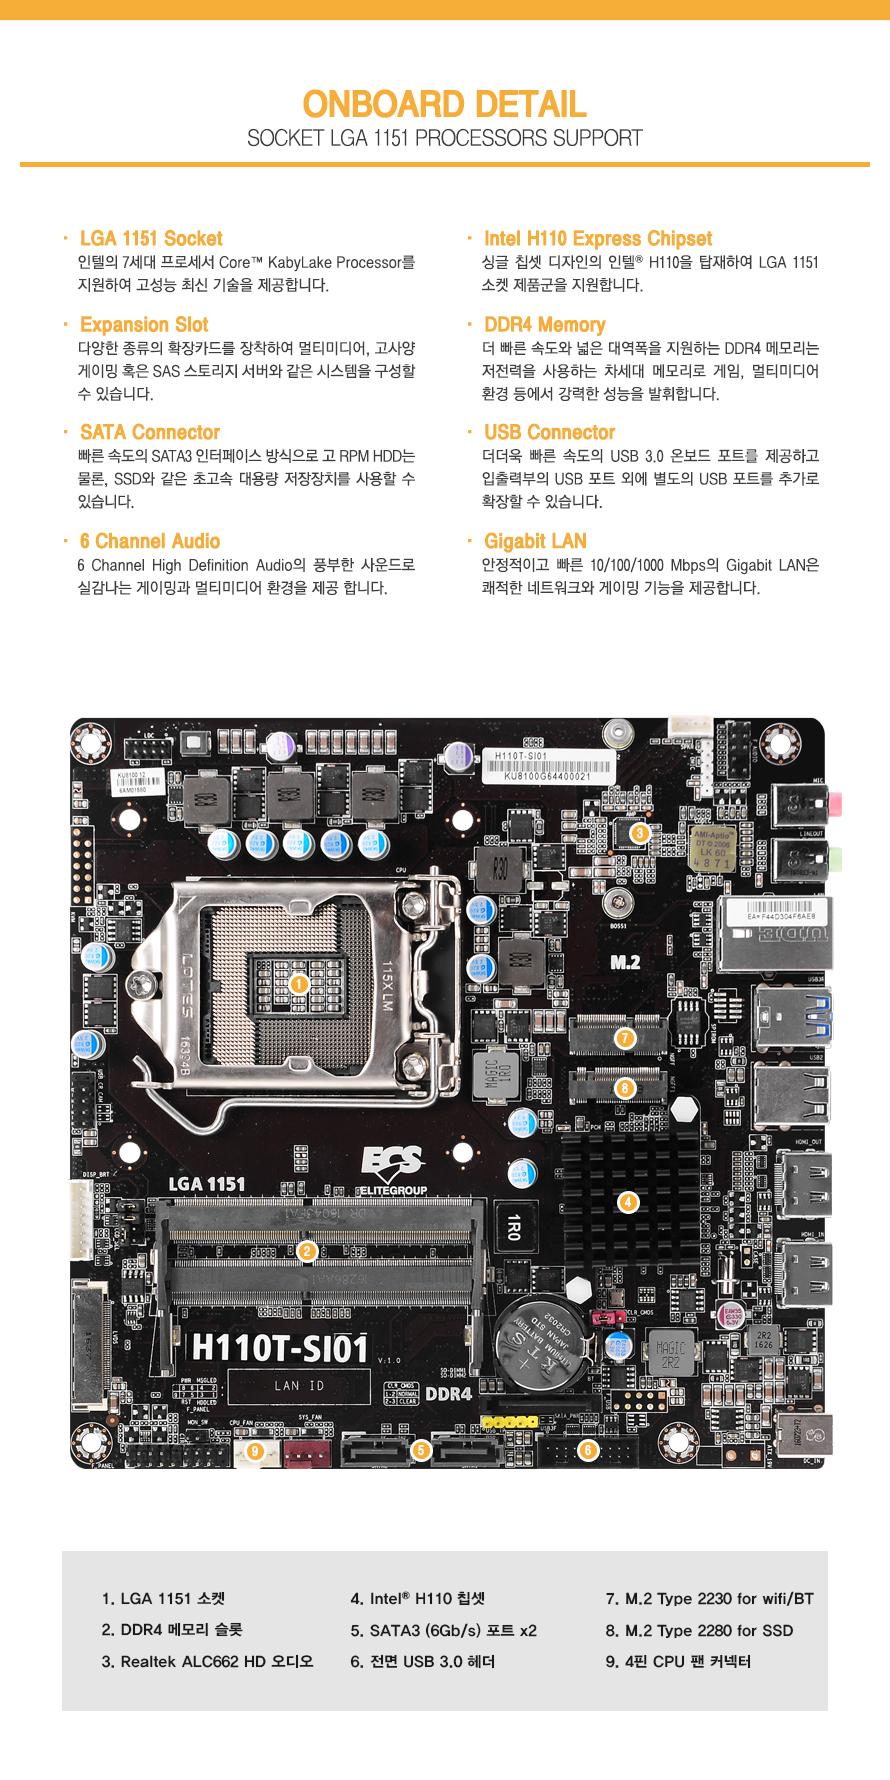 onboard detail        socket lga 1151 processors support                lga 1151 socket        인텔의 7세대 프로세서 core kabylake processor를 지원하여 고성능 최신 기술을 제공합니다                expansion slot        다양한 종류의 확장카드를 장착하여 멀티미디어 고사양 게이밍 혹은 sas 스토리지 서버와 같은        시스템을 구성할 수 있습니다                sata connector         빠른 속도의 sata3 인터페이스 방식으로 고 rpm hdd는 물론 ssd와 같은 초고속 대용량 저장장치를        사용할 수 있습니다                6 channel audio        6 channel high definition audio의 풍부한 사운드로 실감나는 게이밍과 멀티미디어 환경을 제공합니다                intel h110 express chipset        싱글 칩셋 디자인의 인텔 h110을 탑재하여 lga 1151 소켓 제품군을 지원합니다.                ddr4 memory        더 빠른 속도와 넓은 대역폭을 지원하는 ddr4 메모리는 저전력을 사용하는 차세대 메모리로 게임        멀티미디어 환경 등에서 강력한 성능을 발휘합니다                usb connector                더더욱 빠른 속도의 usb 3.0 온보드 포트를 제공하고 입출력부의 usb포트 외에 별도의 usb포트를         추가로 확장할 수 있습니다                gigabit lan                안정적이고 빠른 10 100 1000 mbps의 gigabit lan은 쾌적한 네트워크와 게이밍 기능을 제공합니다